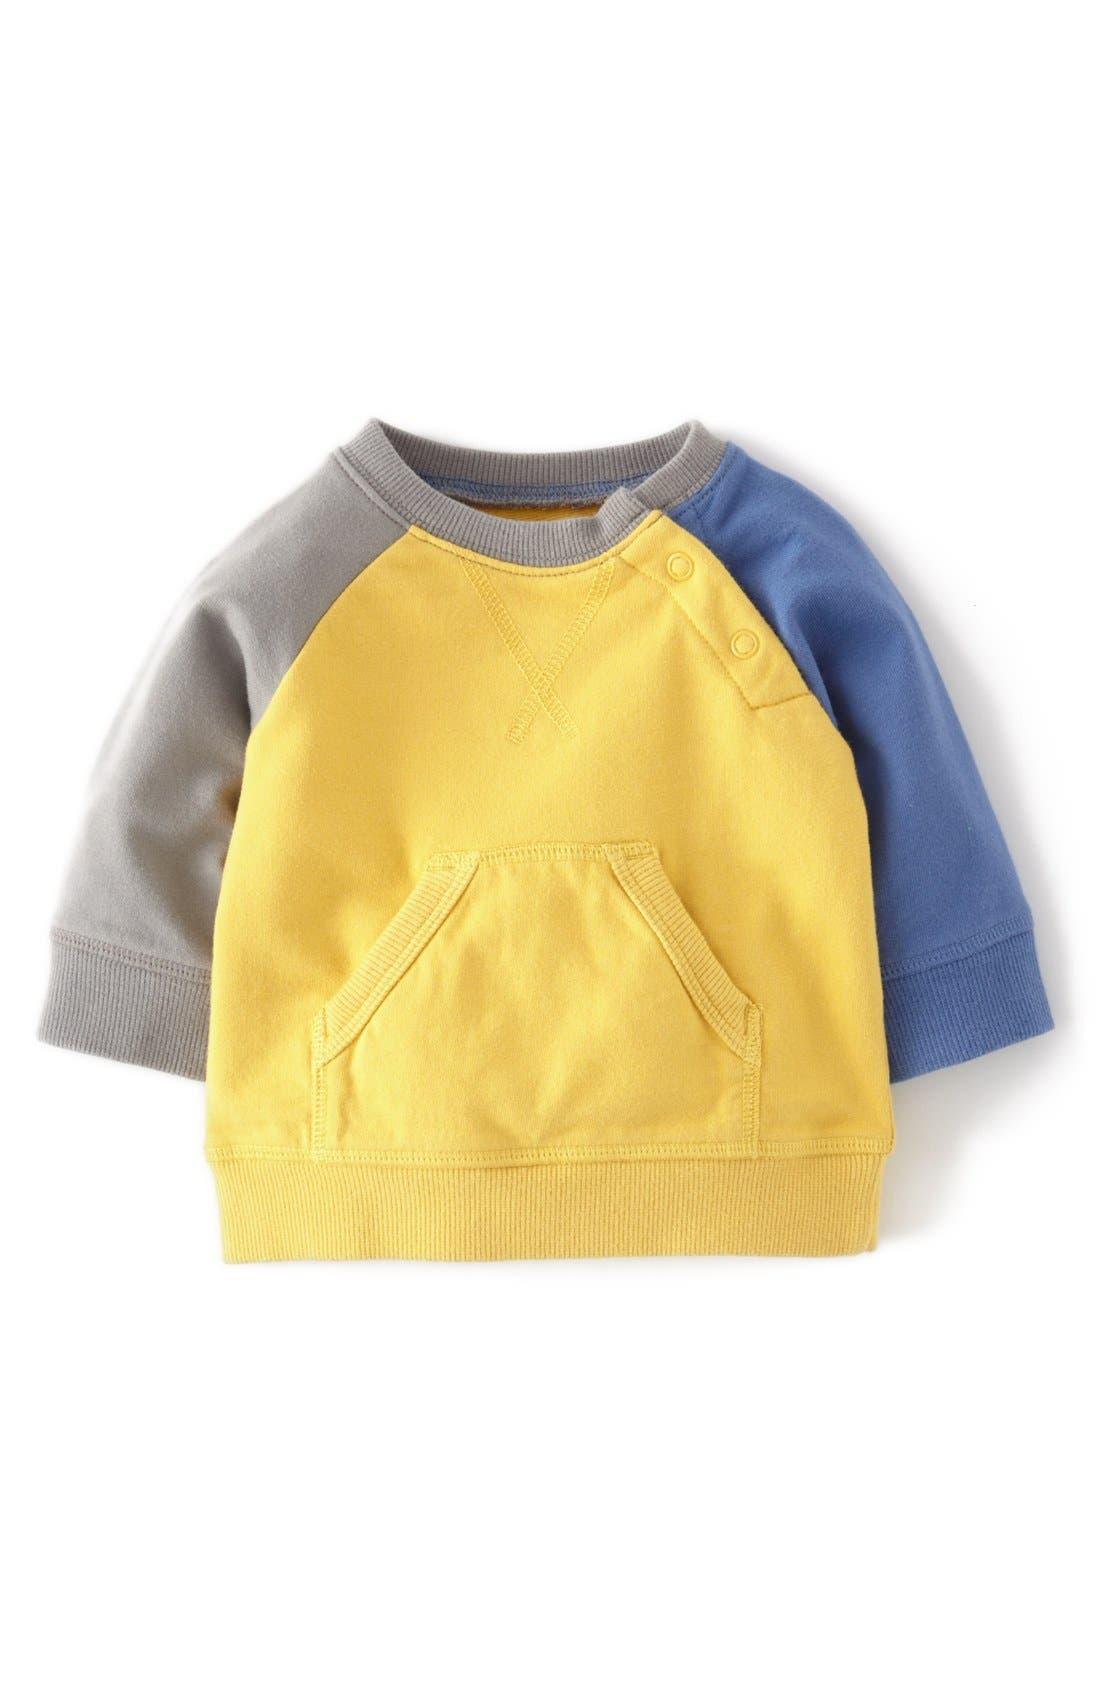 Main Image - Mini Boden 'Hotchpotch' Sweatshirt (Baby Boys)